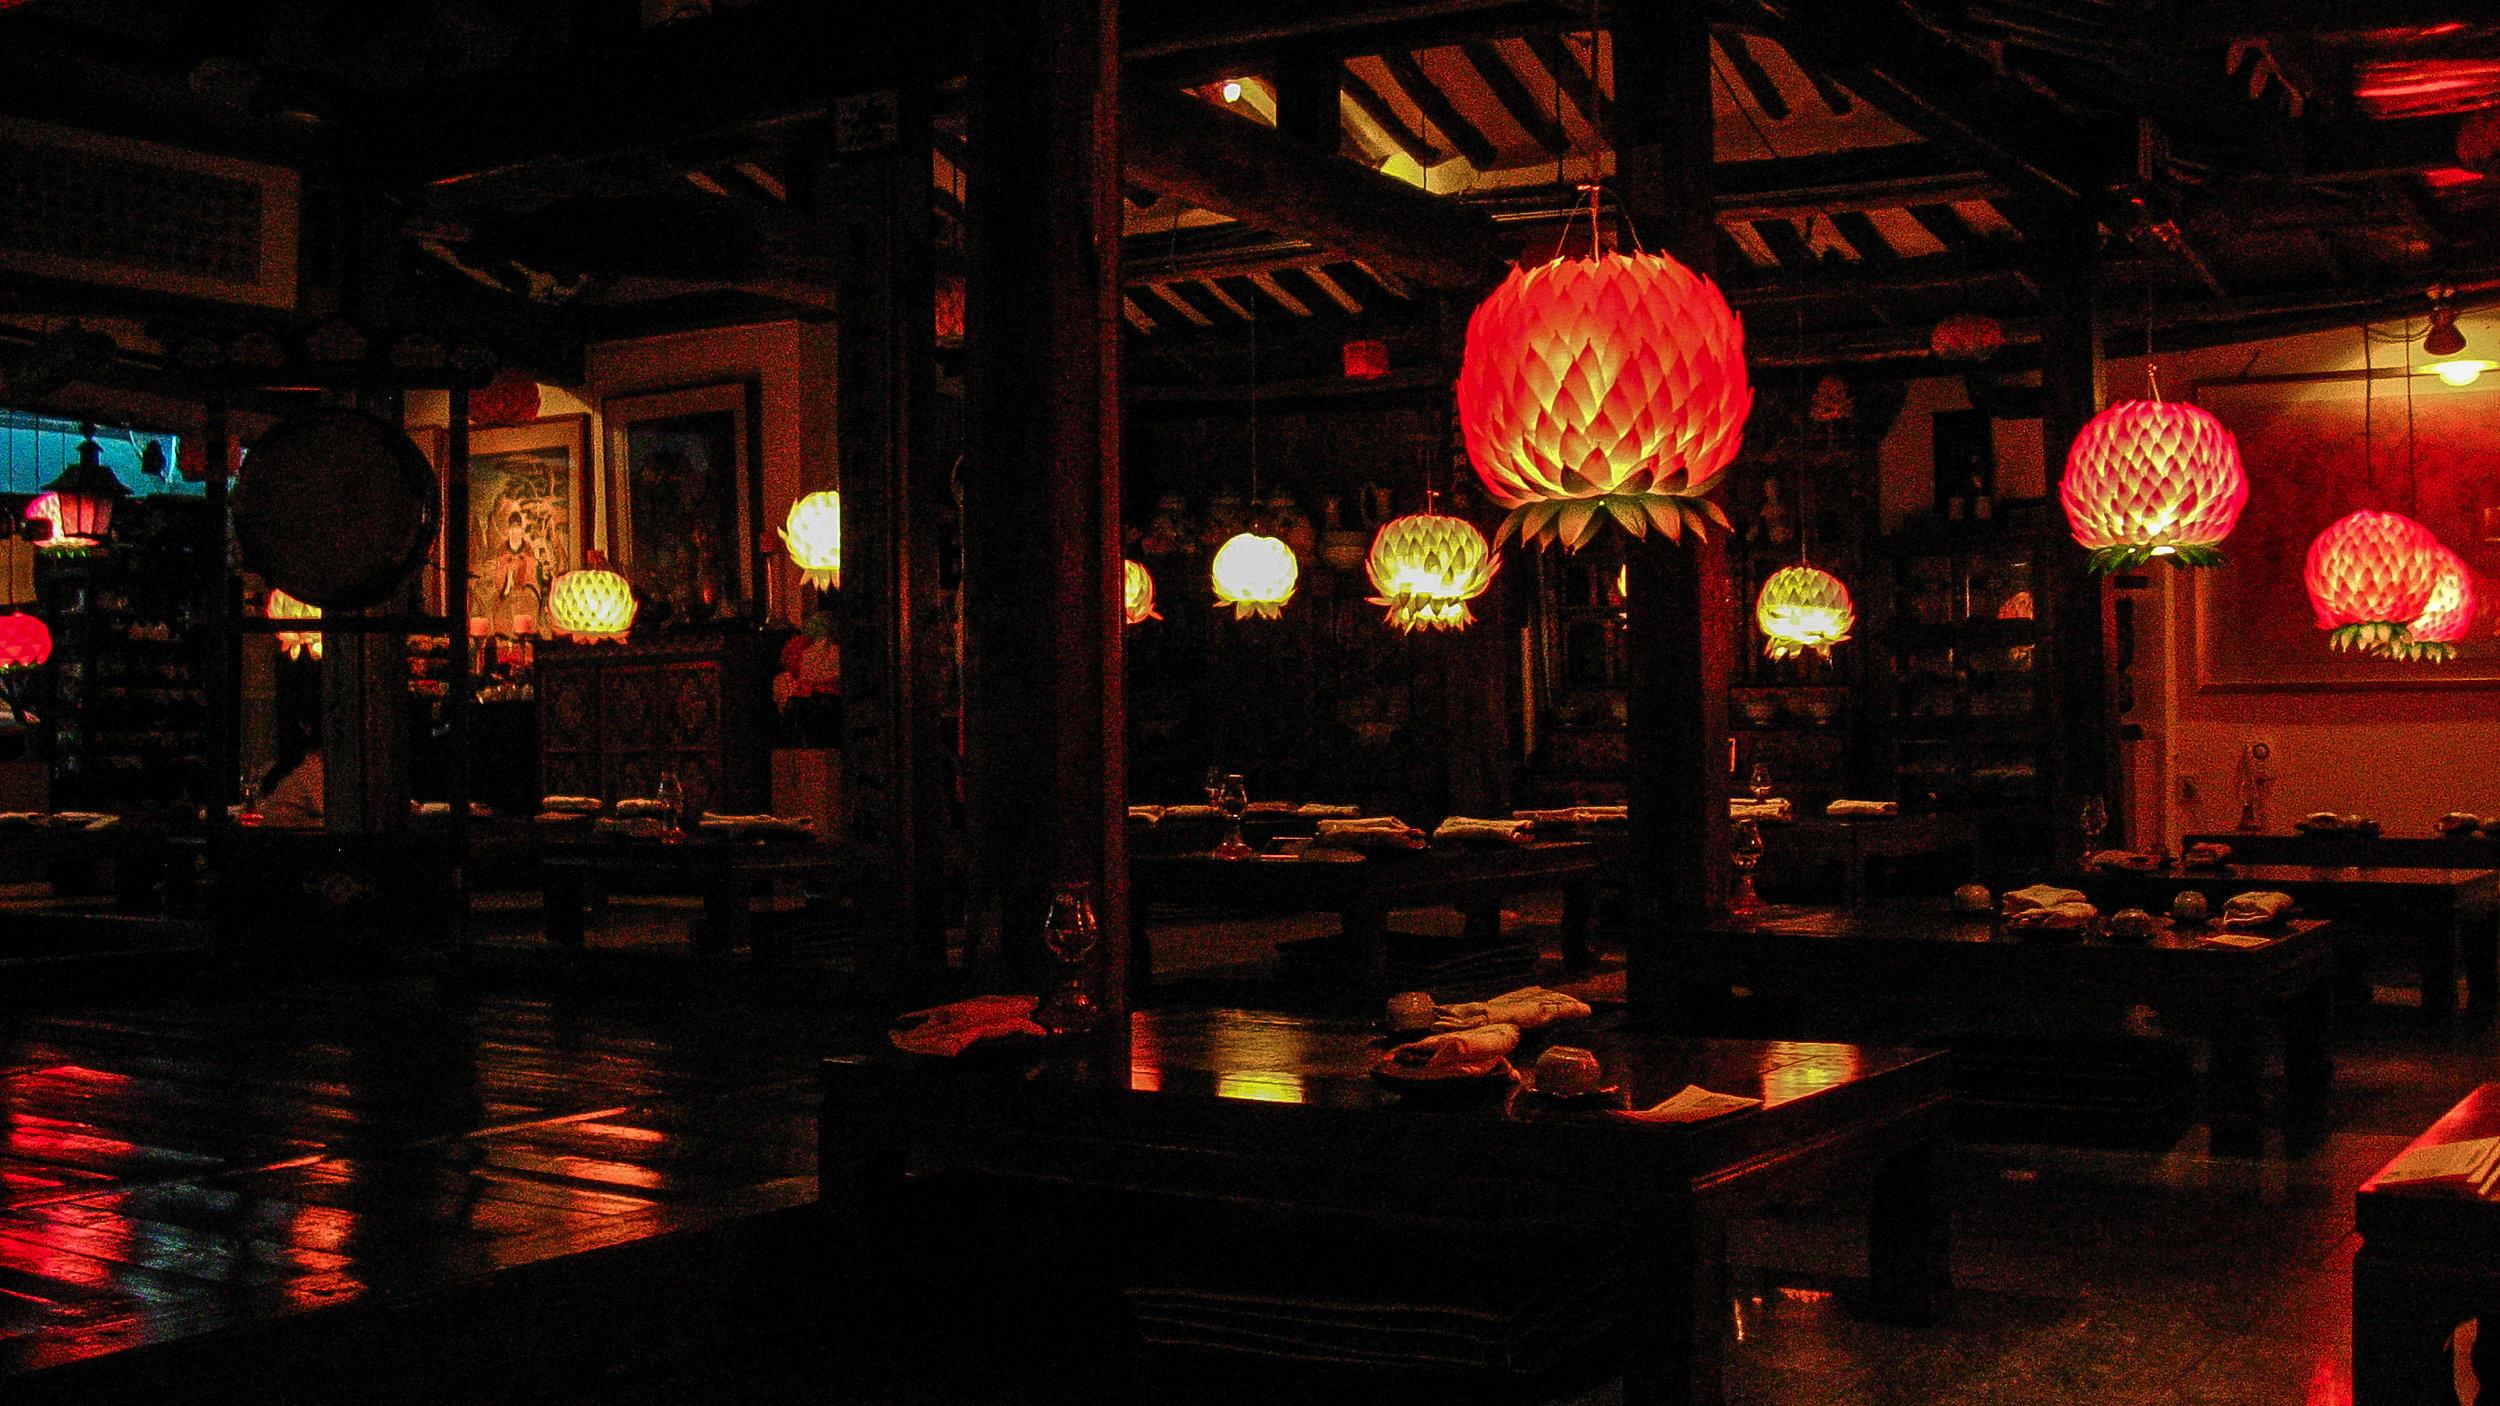 San Chon, a Buddhist vegetarian restaurant